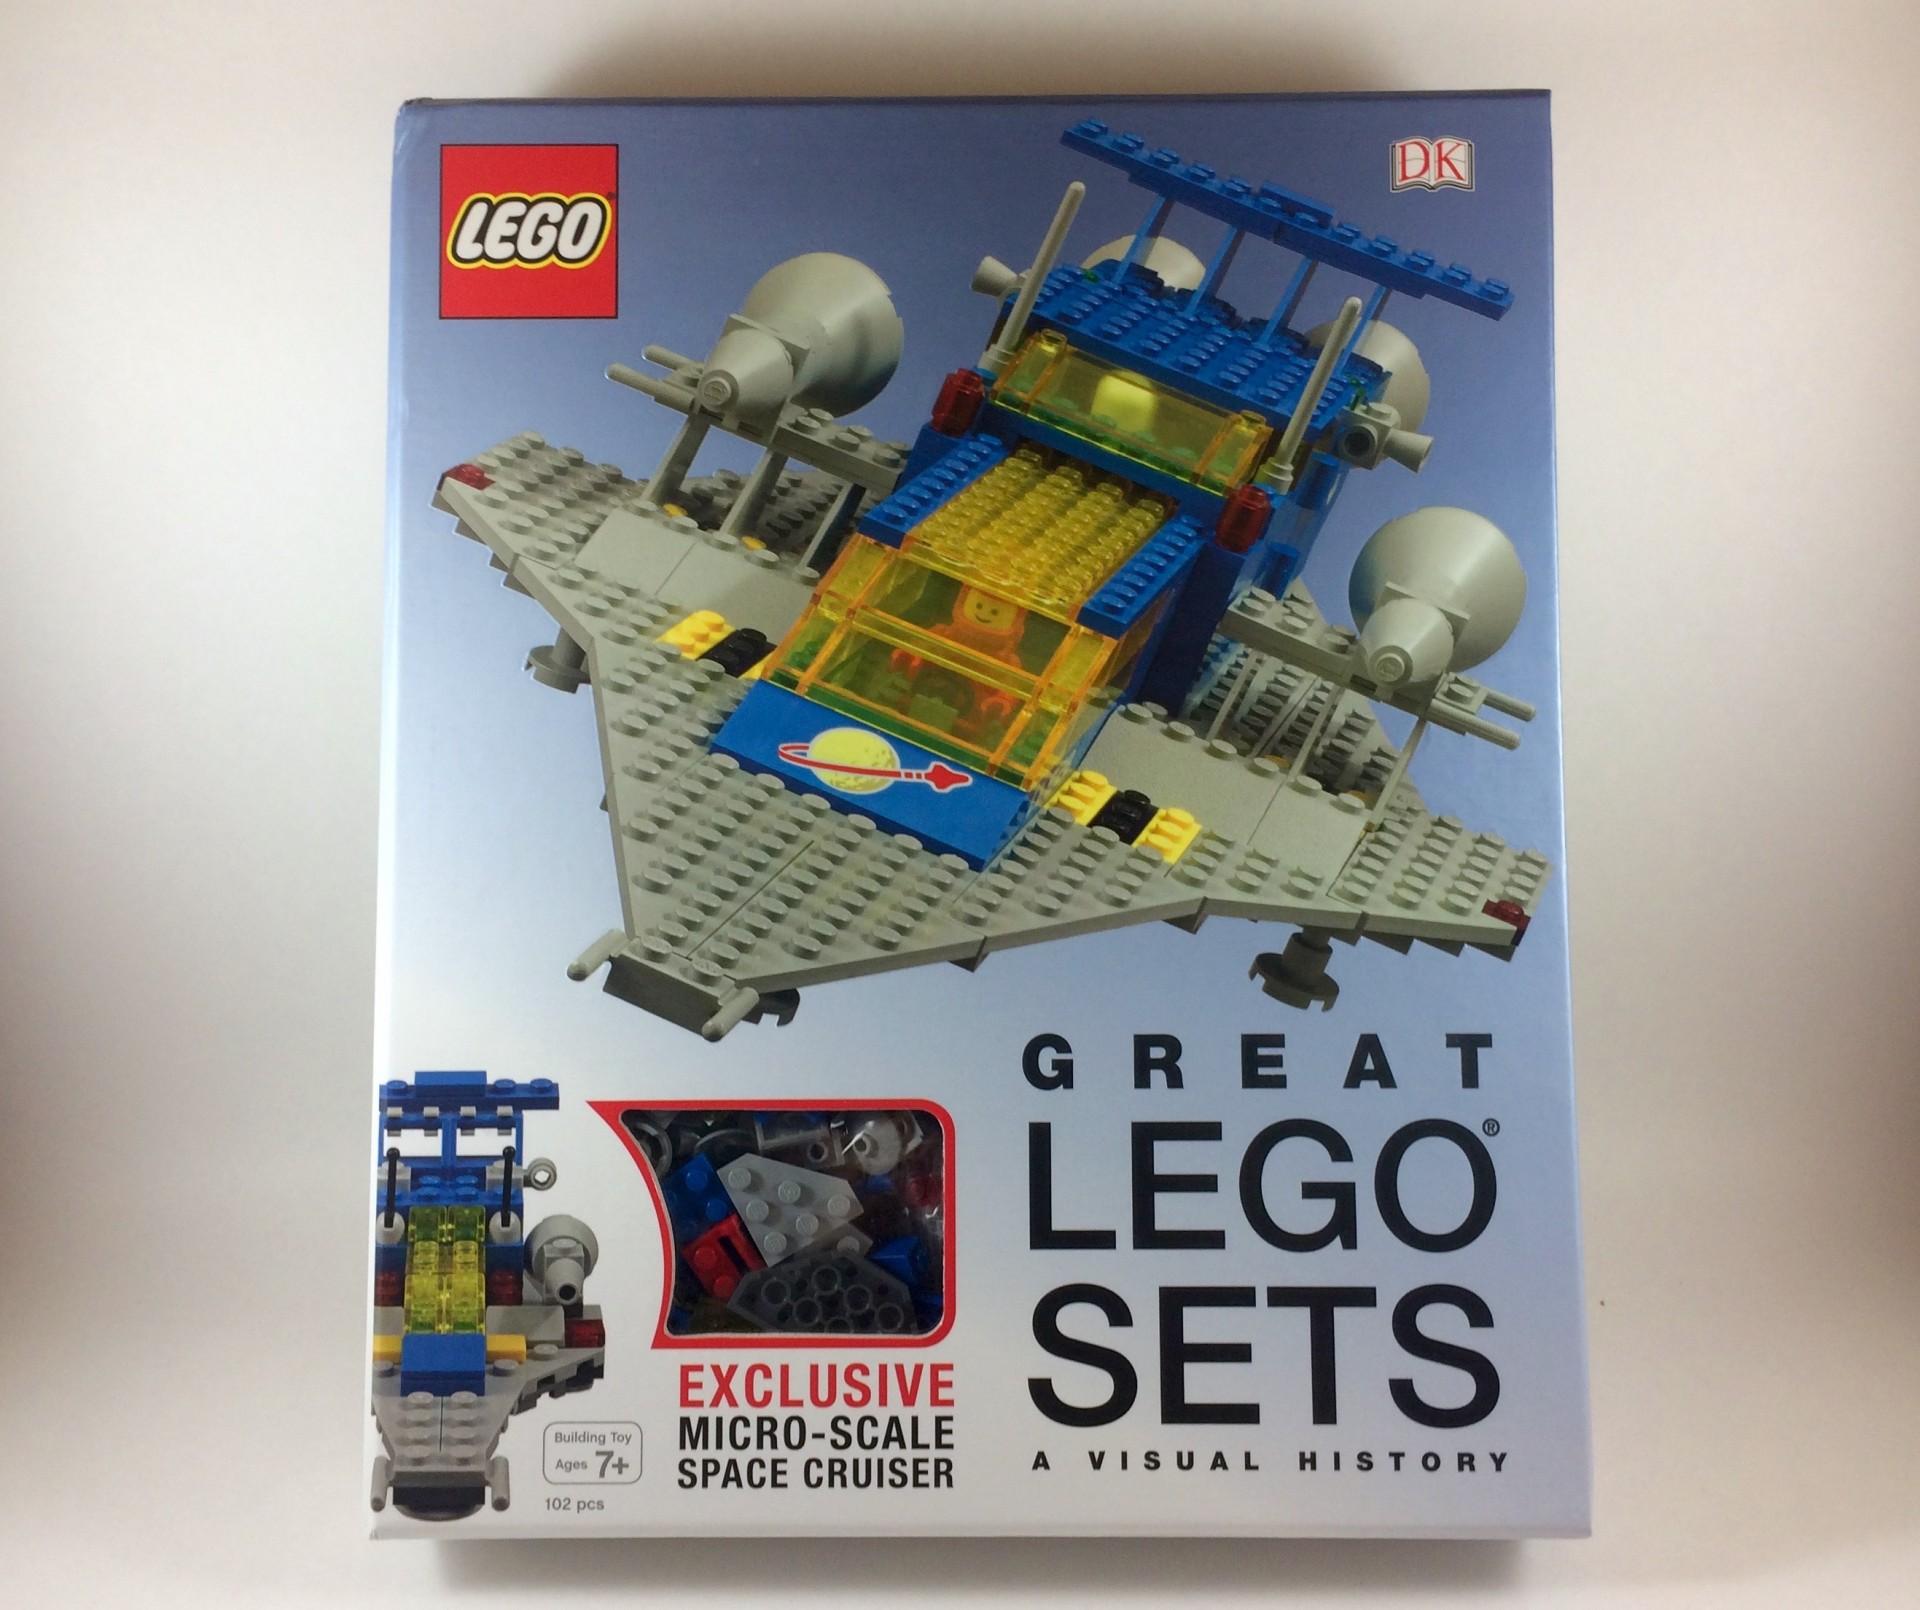 DK Publishing's Great LEGO Sets: A Visual History